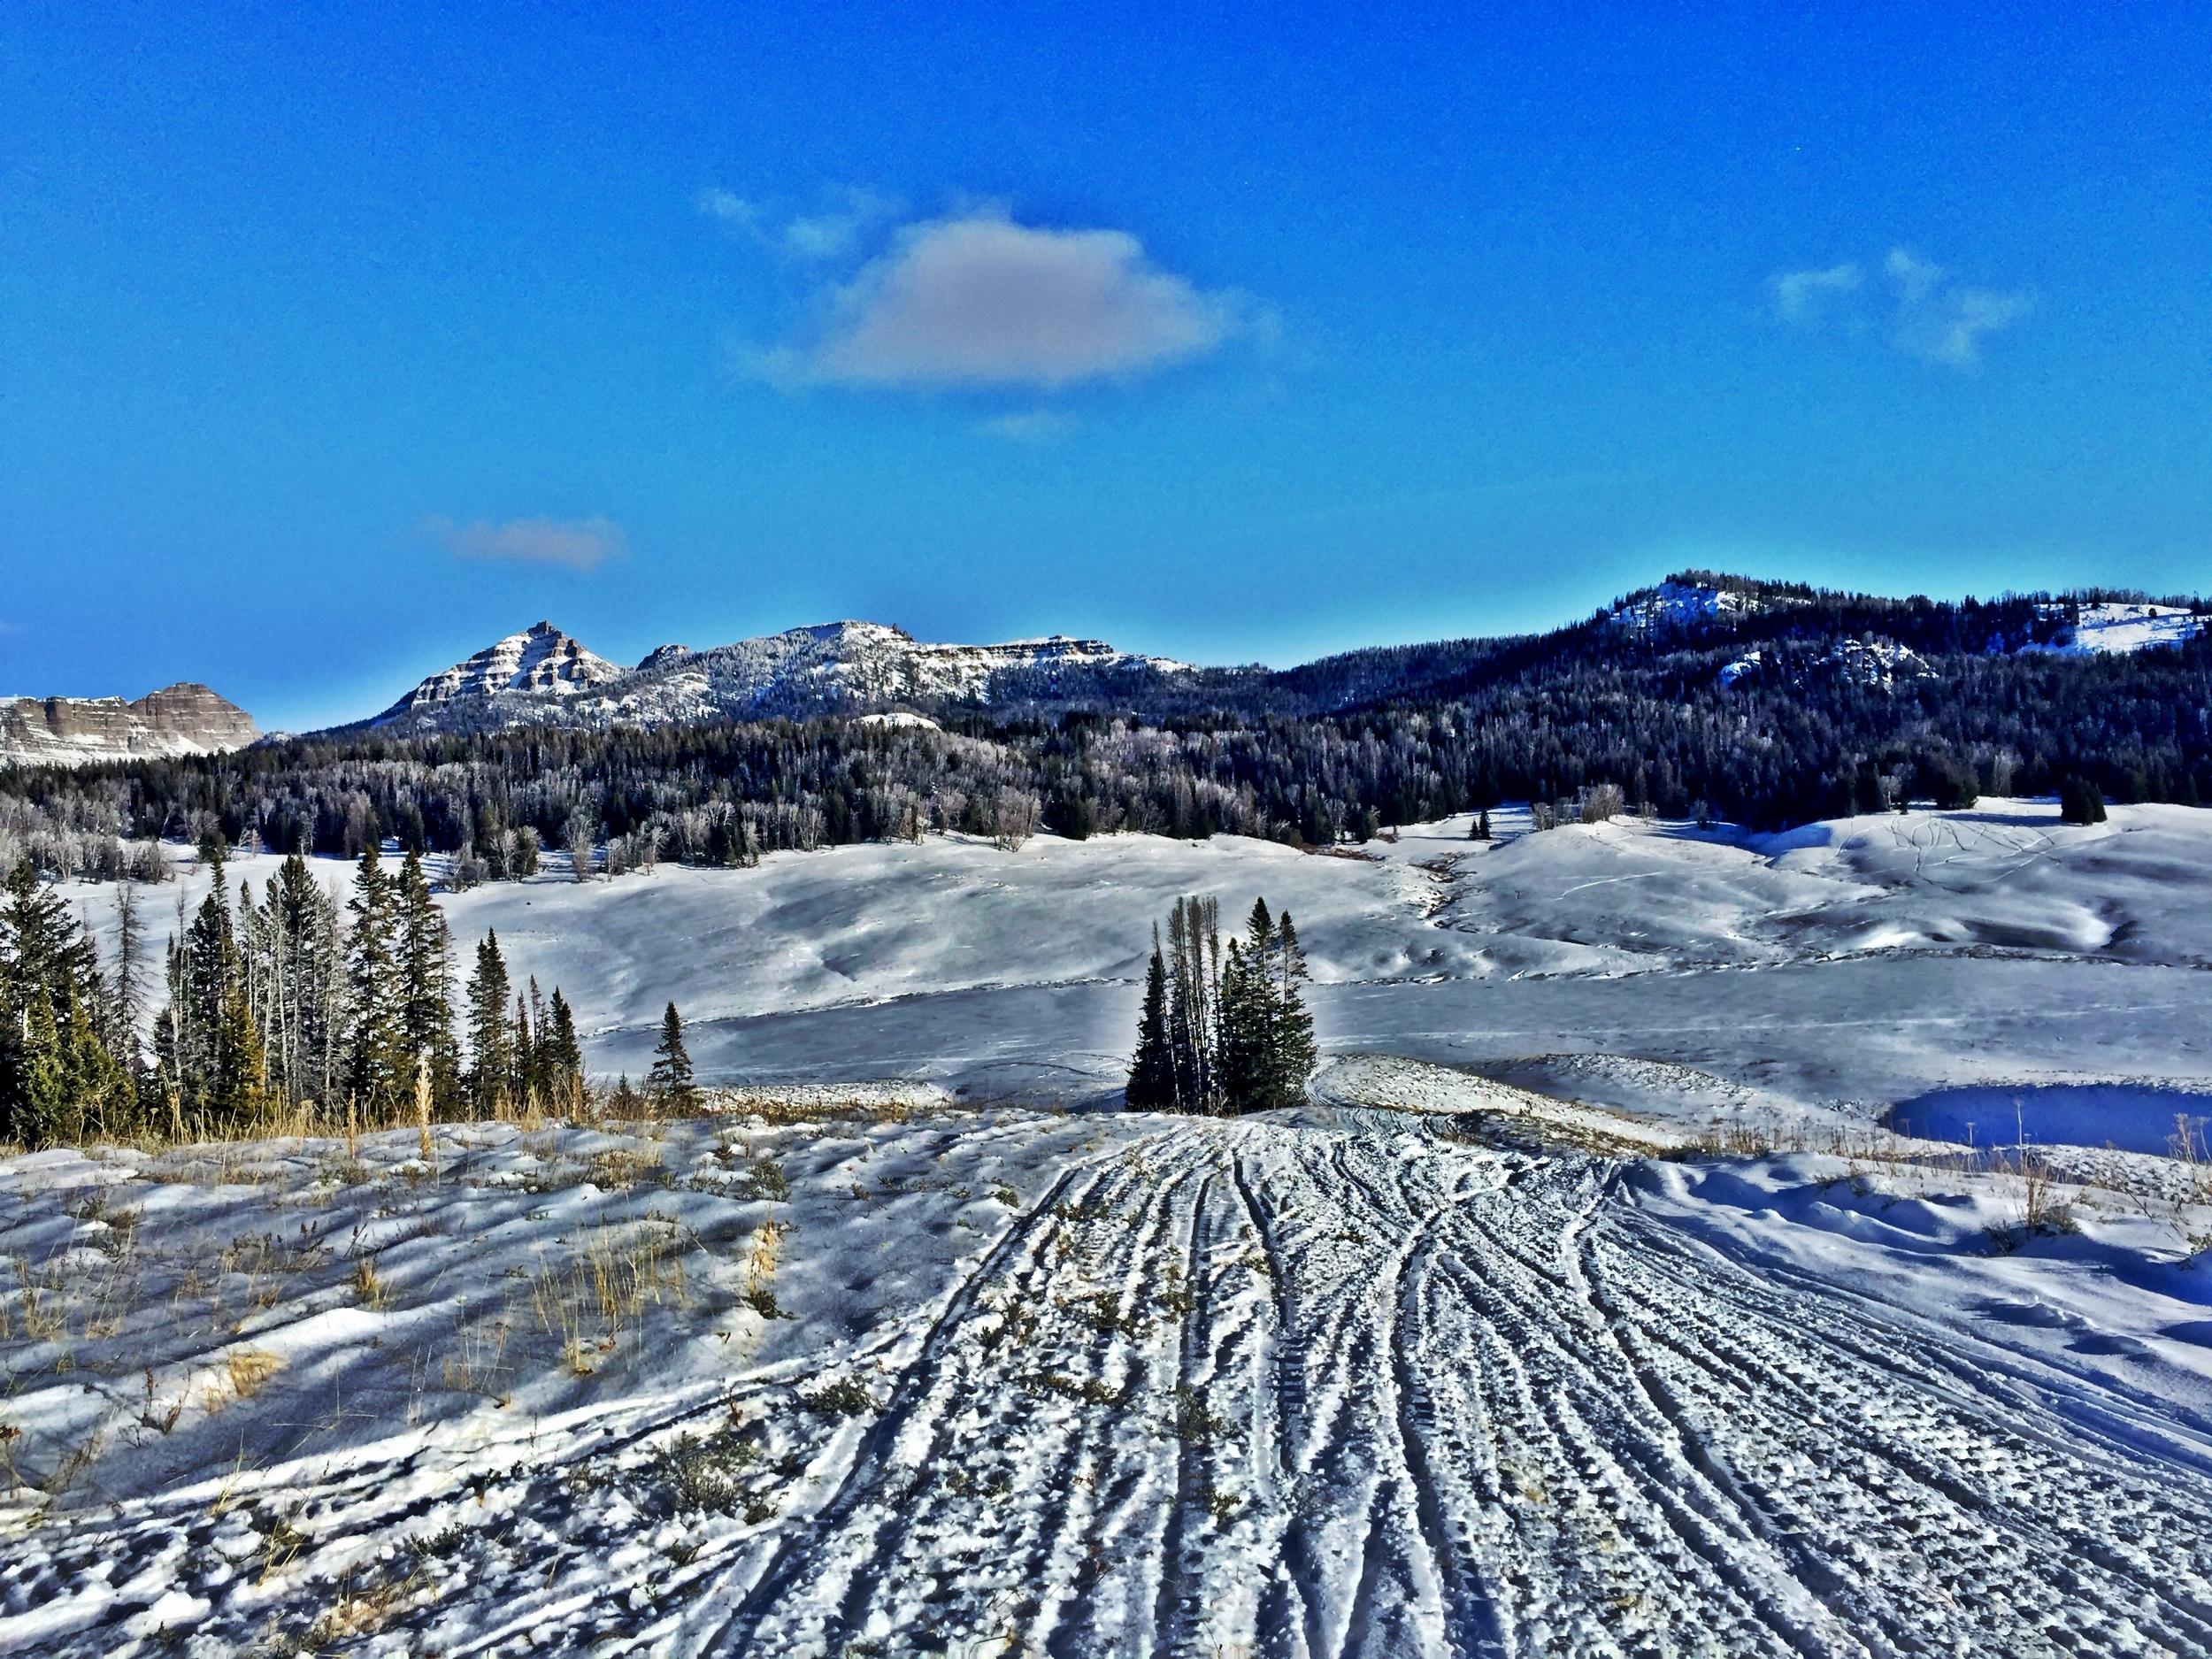 Grungy Slopes, Moran Wyoming, Togwotee Mountain Lodge 18.jpg